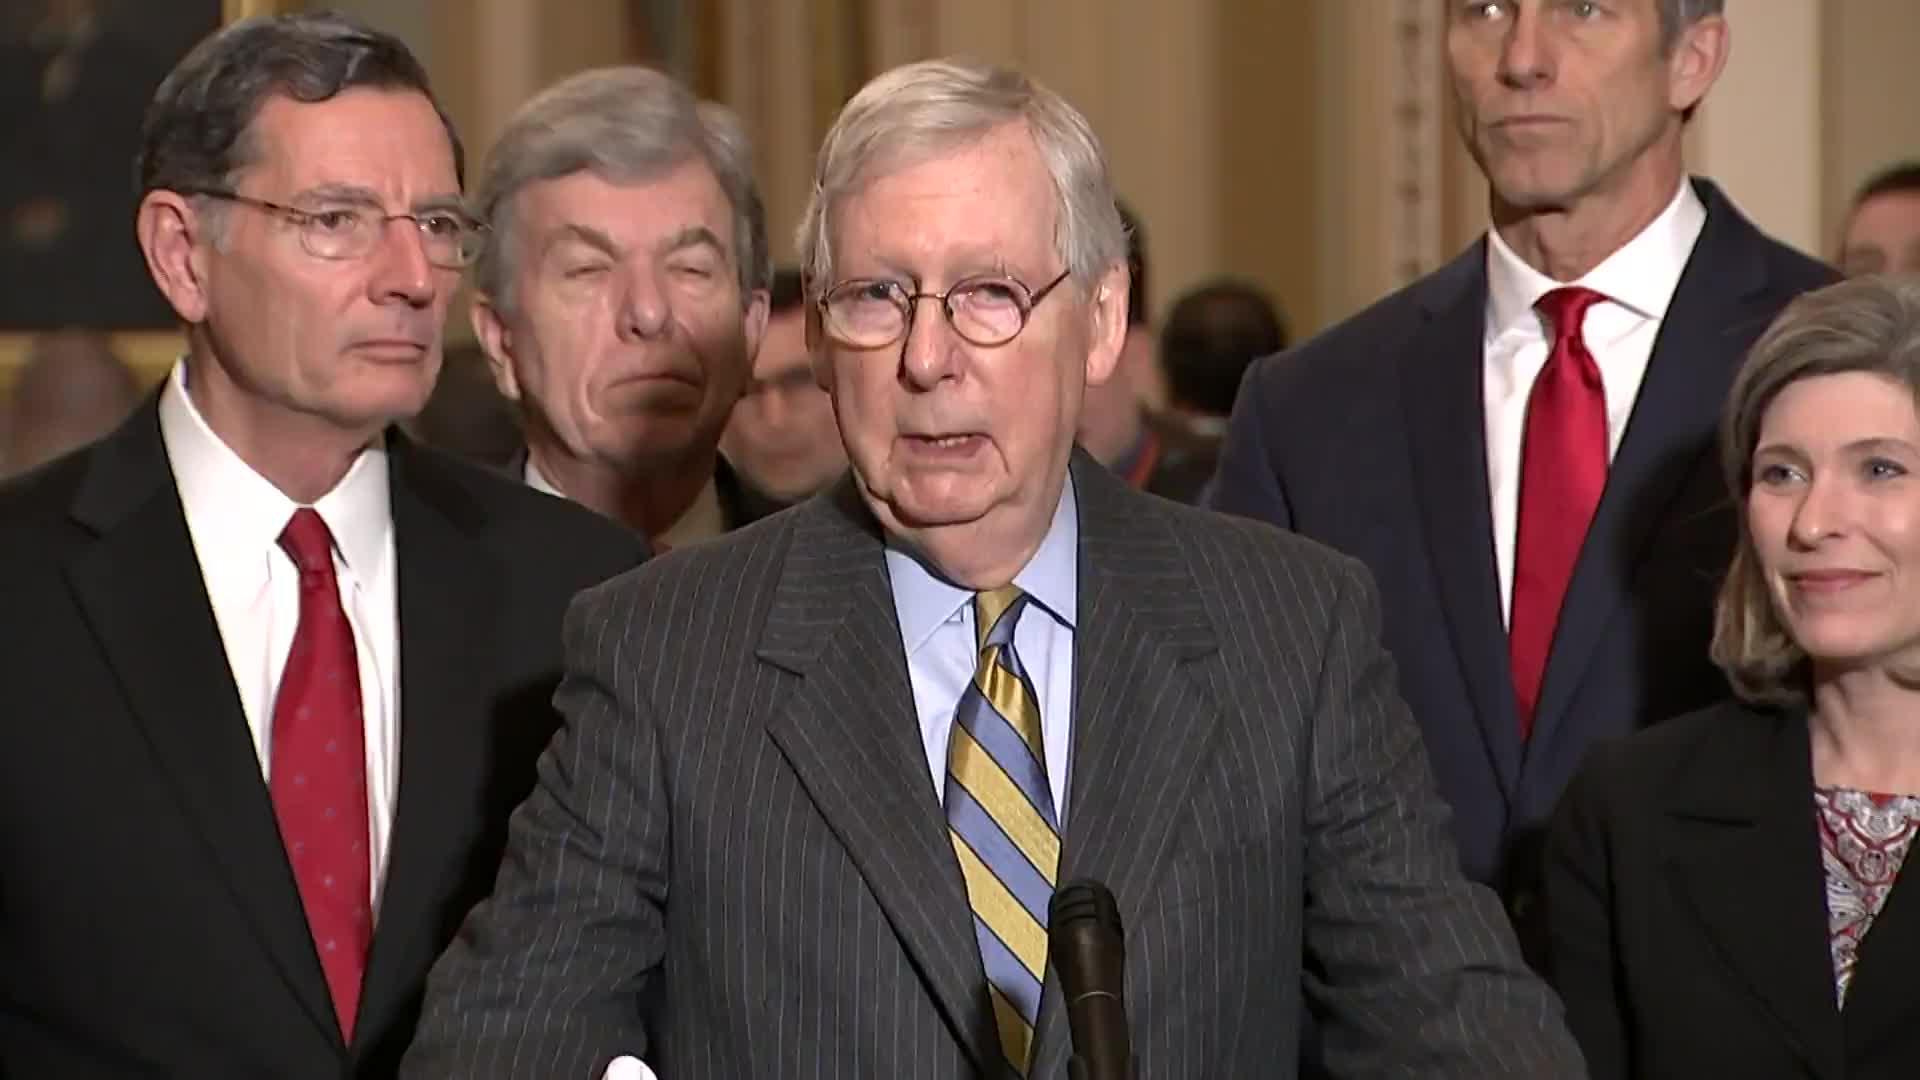 Democratic Sen. Sherrod Brown fine with Hunter Biden testifying in Trump impeachment trial